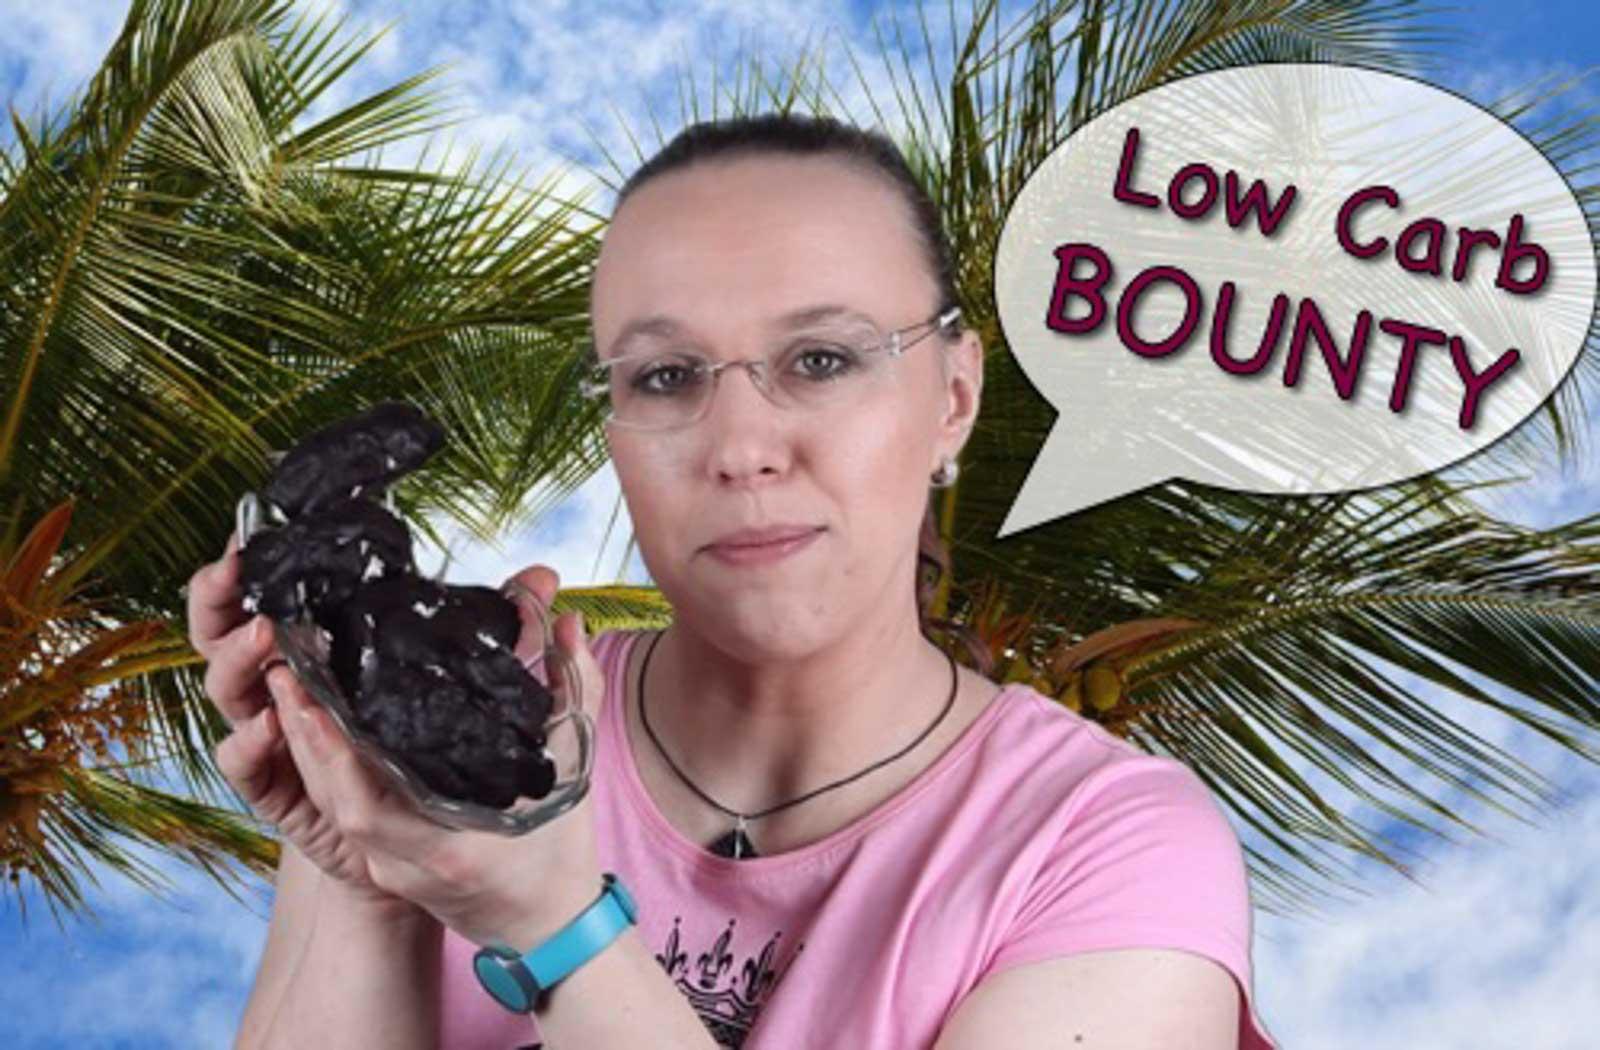 Bounty goes Youtube